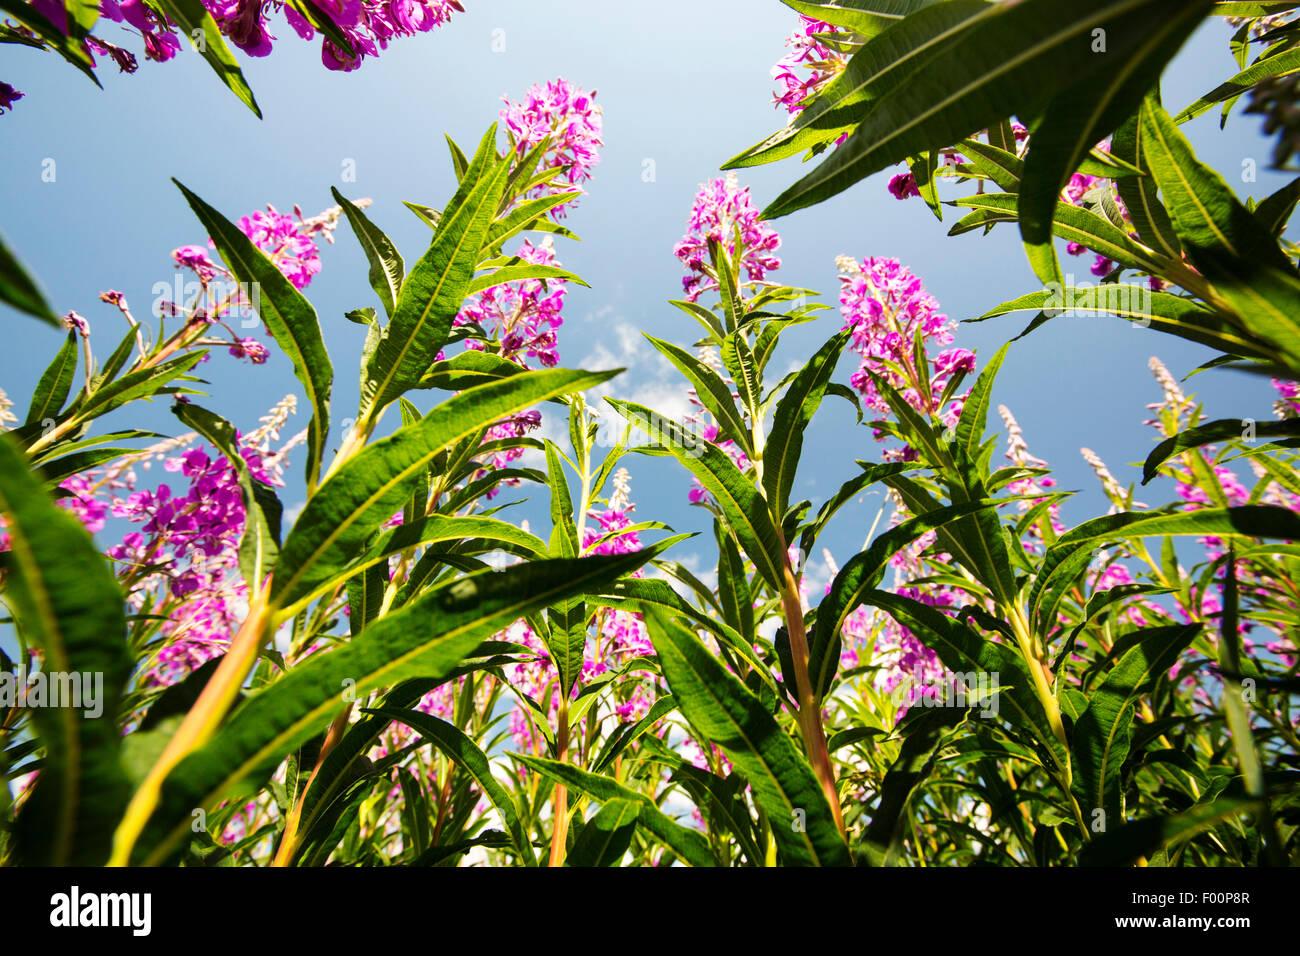 Rosebay Willowherb, Chamerion angustifolium flowering in the Lyth Valley, Cumbria, UK. Stock Photo